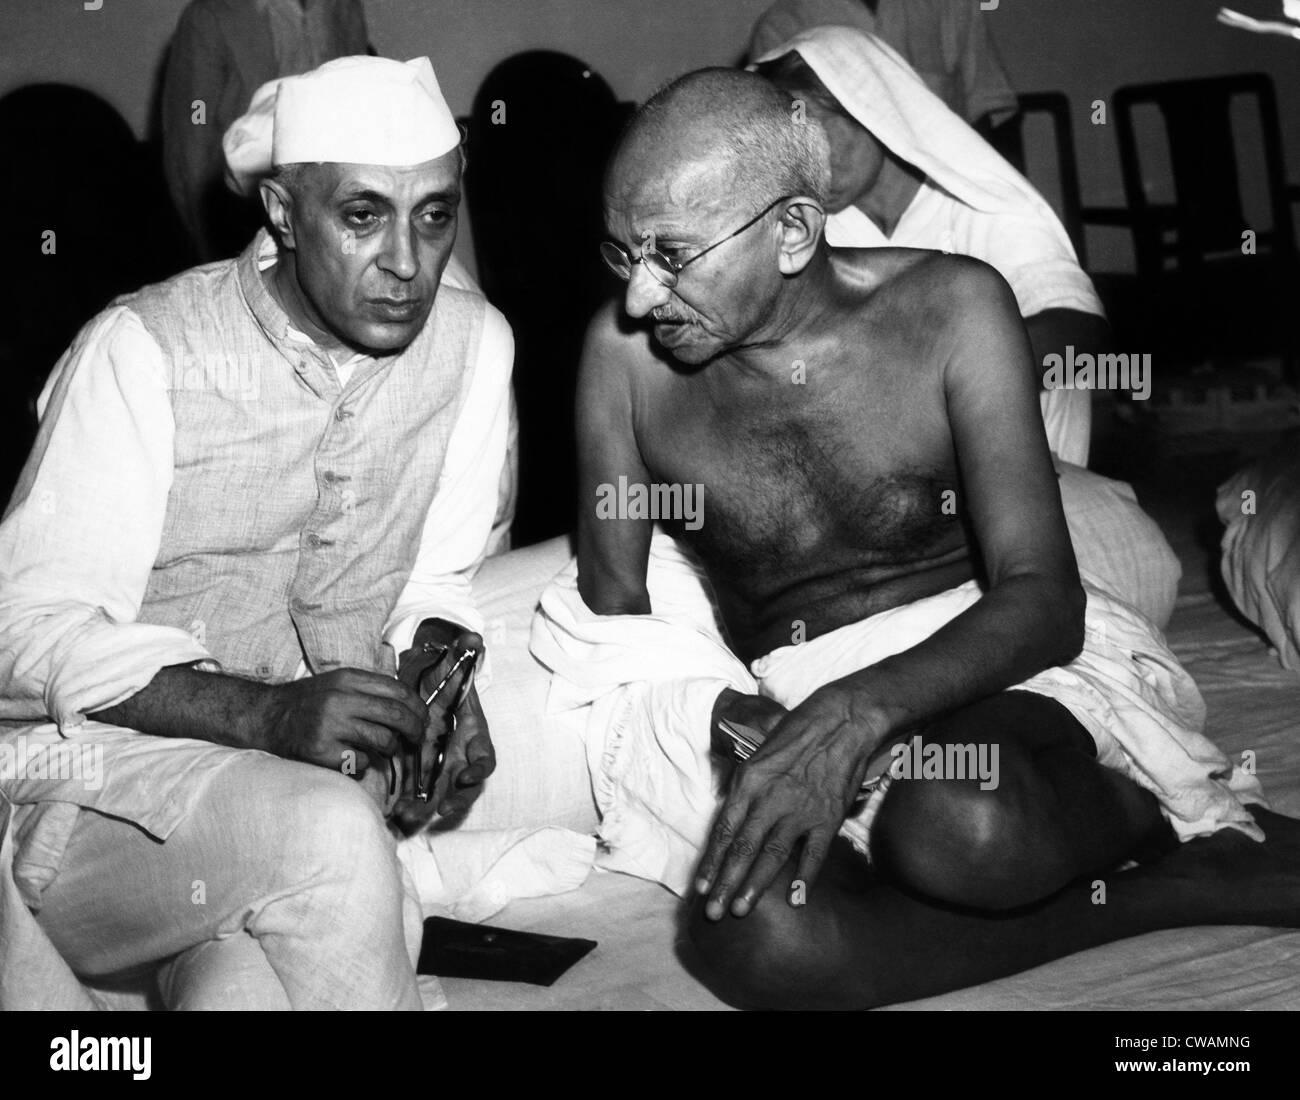 Rashtrapati Jawharlal Nehru and Mahatma Gandhi in 1946.Courtesy: CSU Archives/Everett Collection - Stock Image